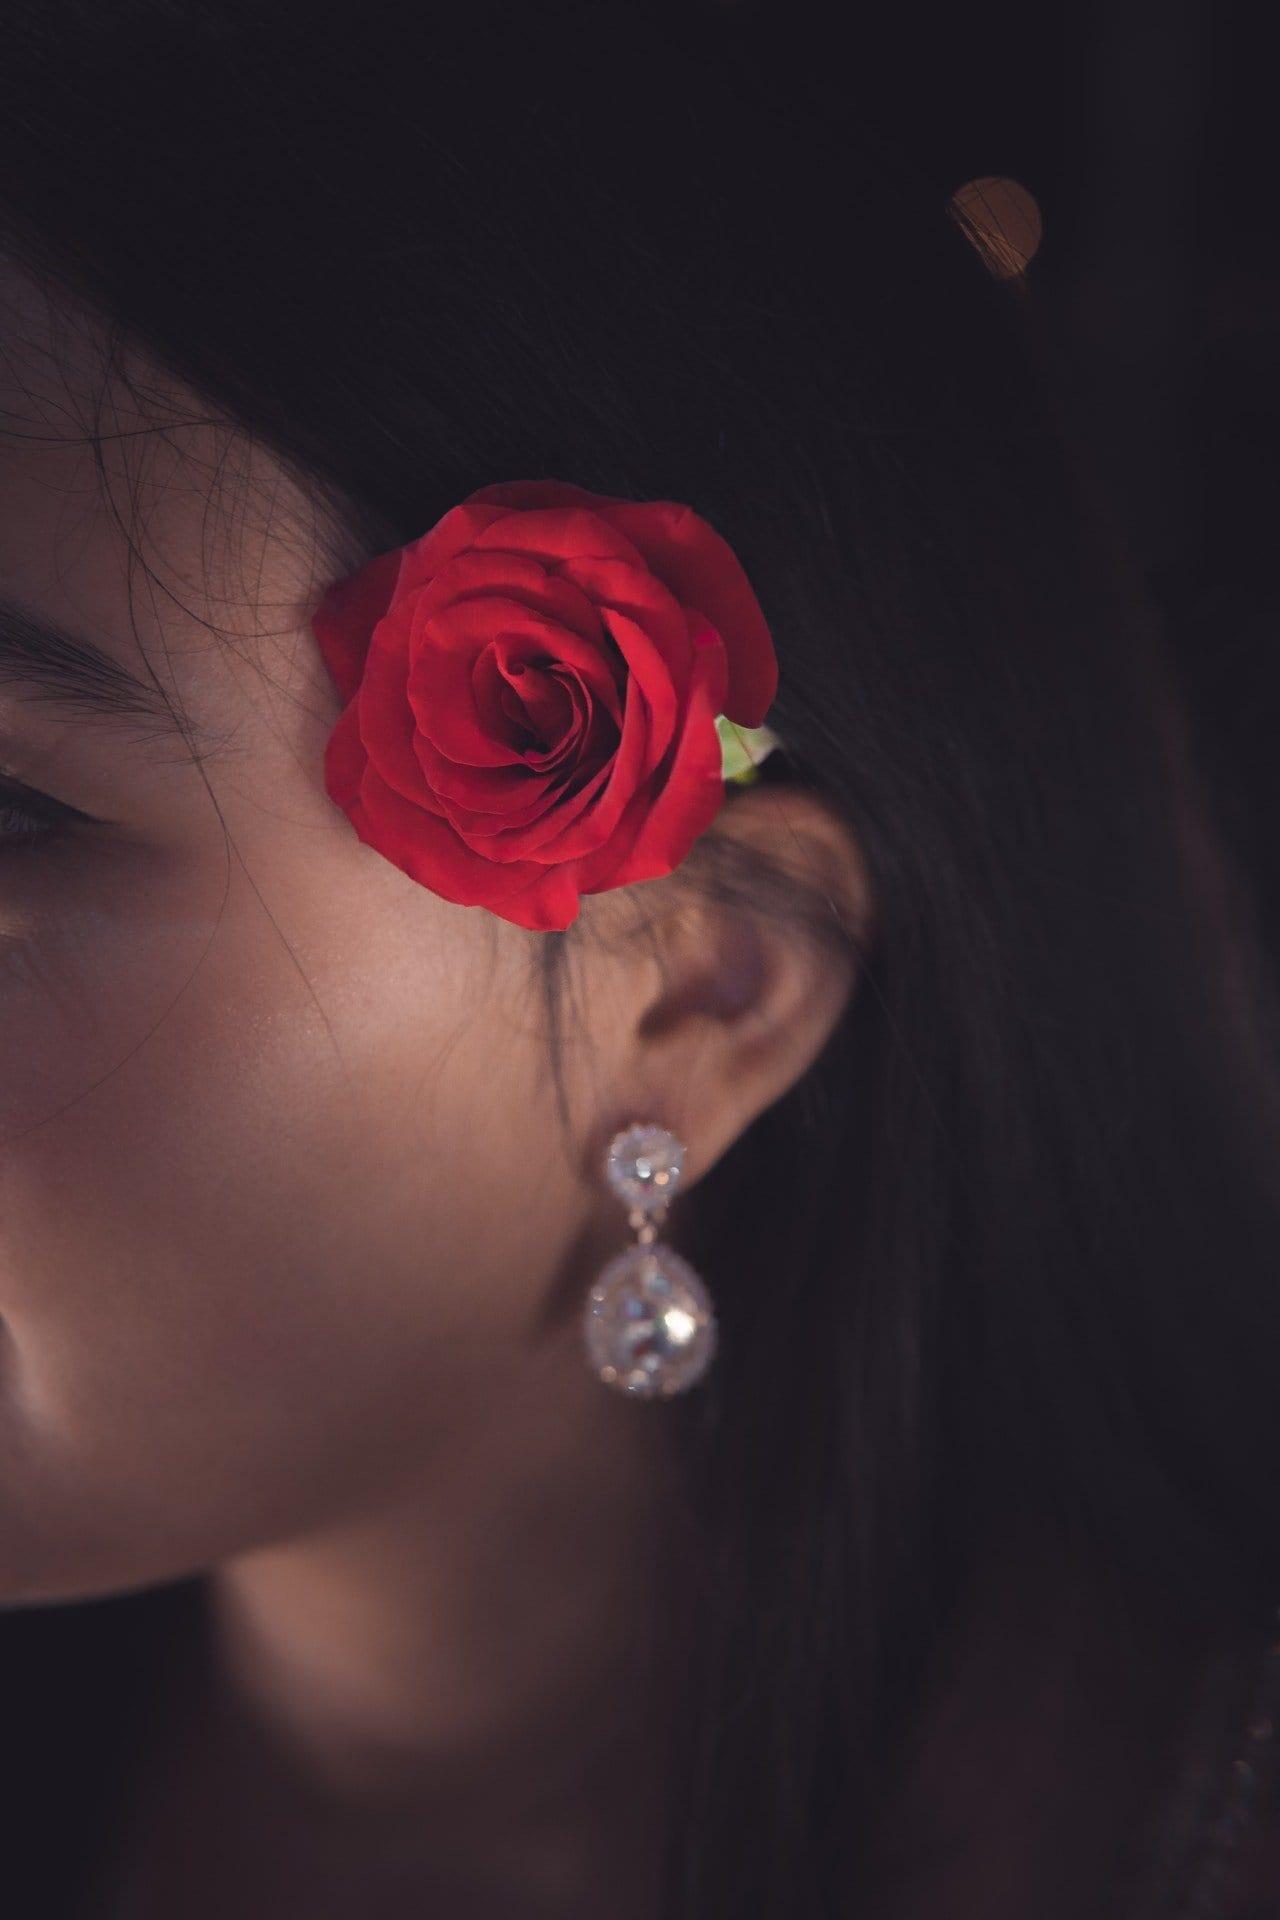 red-rose-on-women-s-ear-